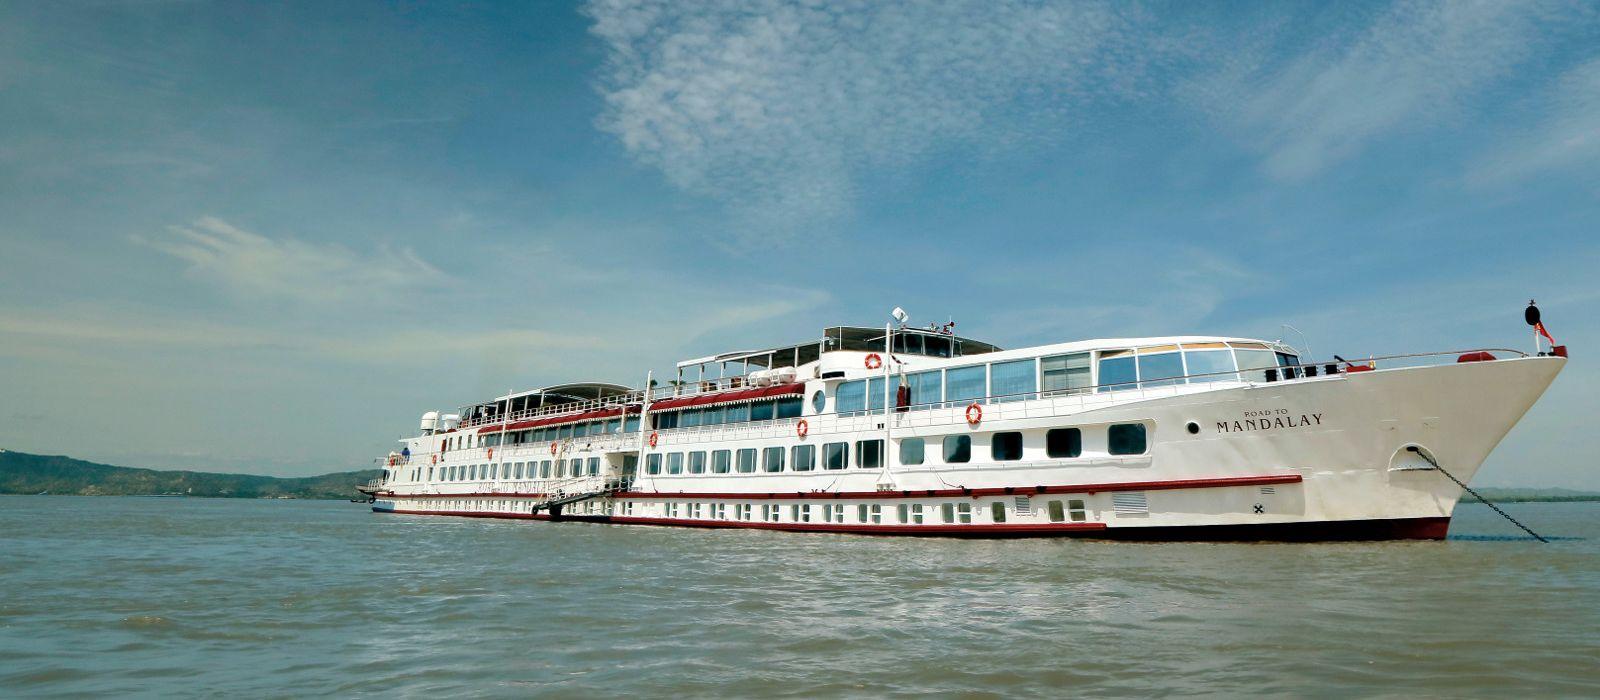 Hotel Road to Mandalay Myanmar